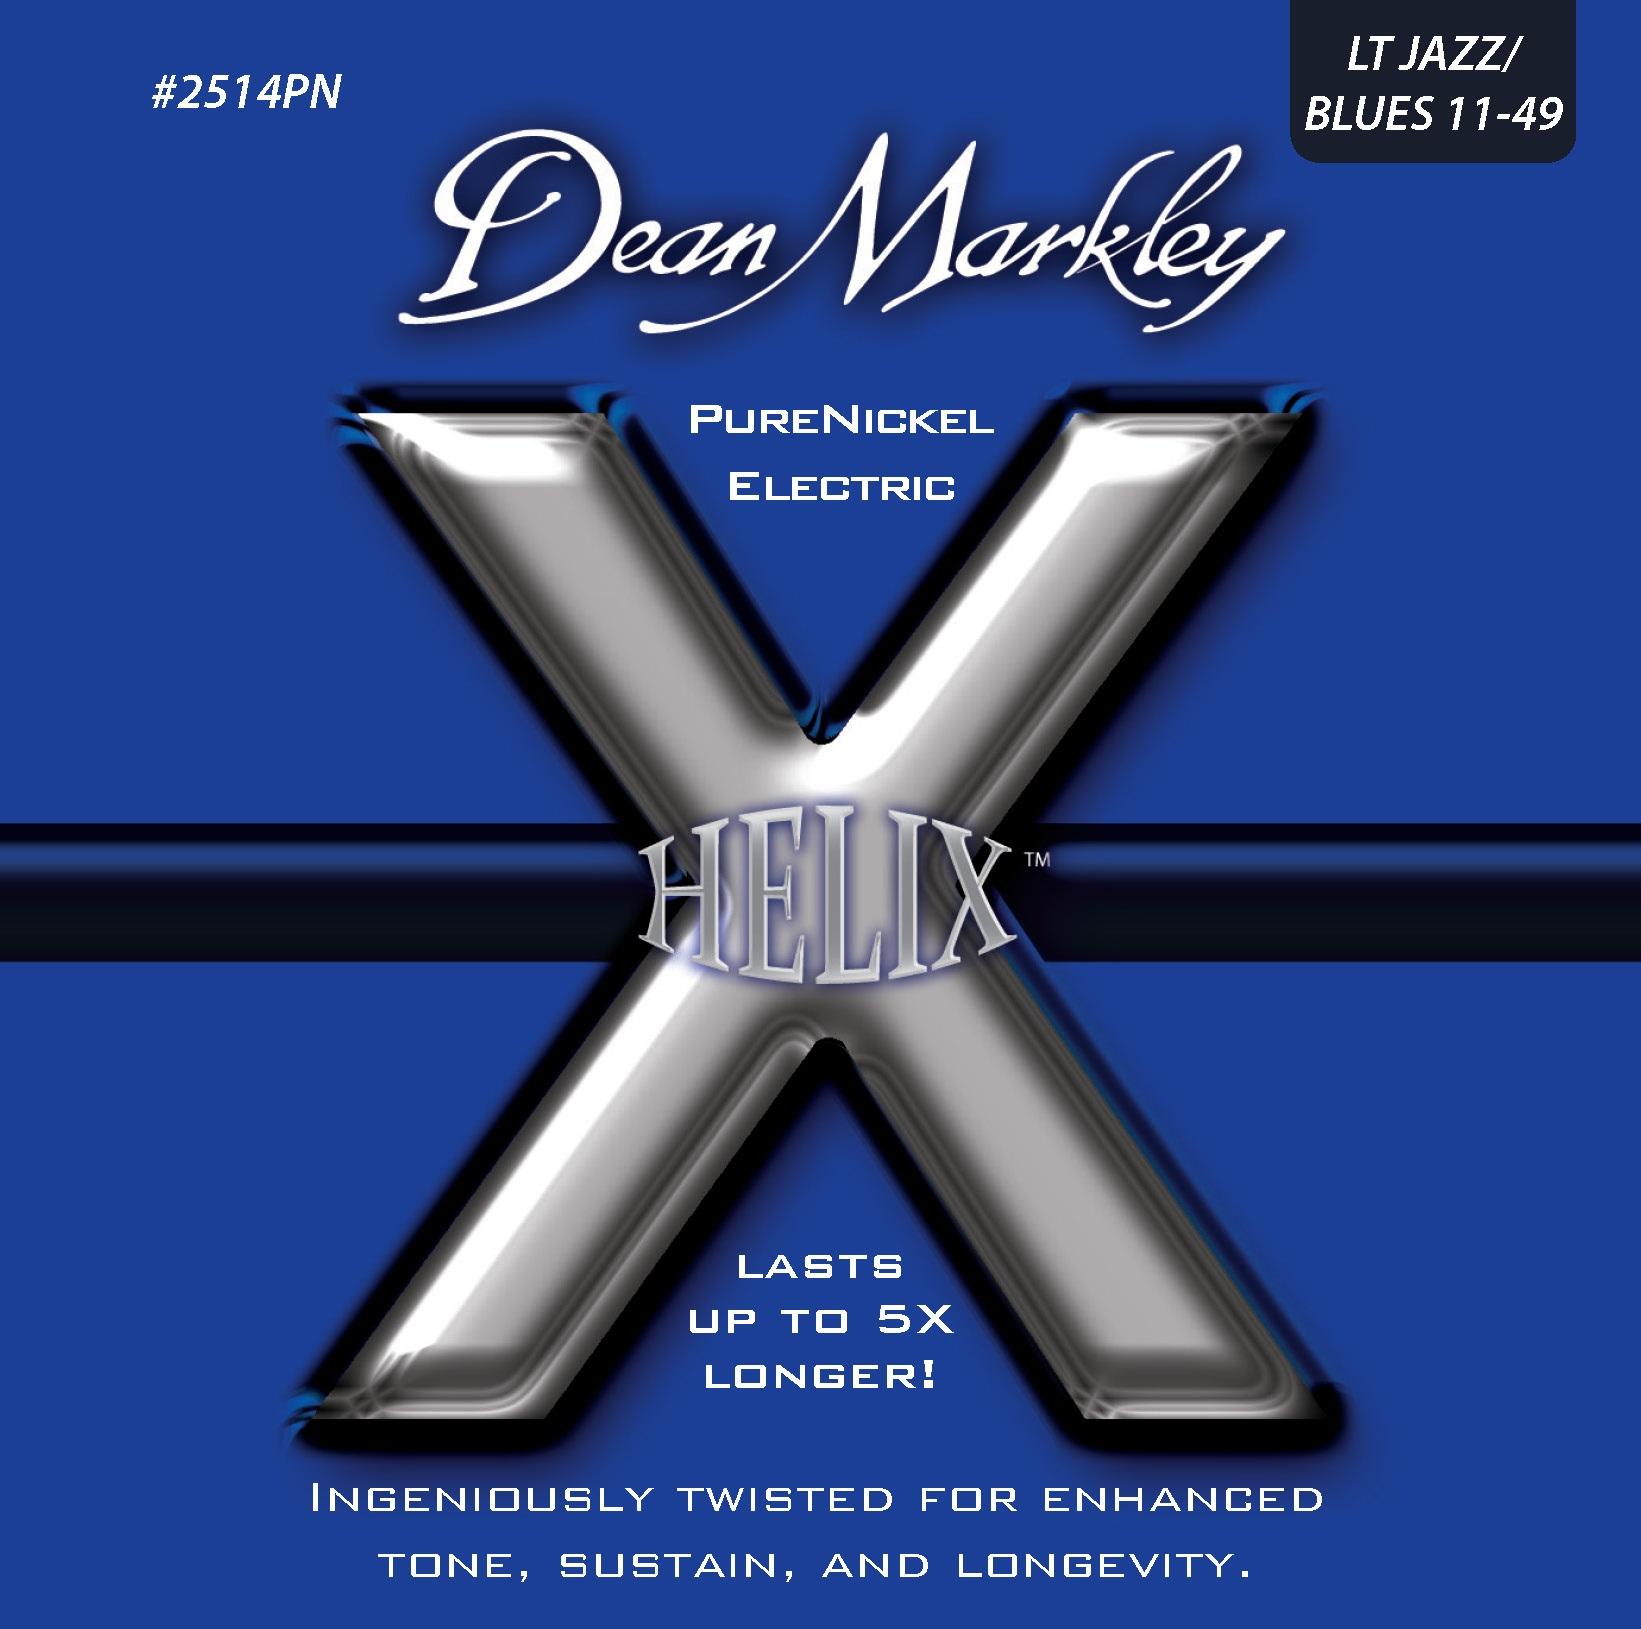 Dean Markley 2514PN JAZZ 11-49 Helix PureNickel